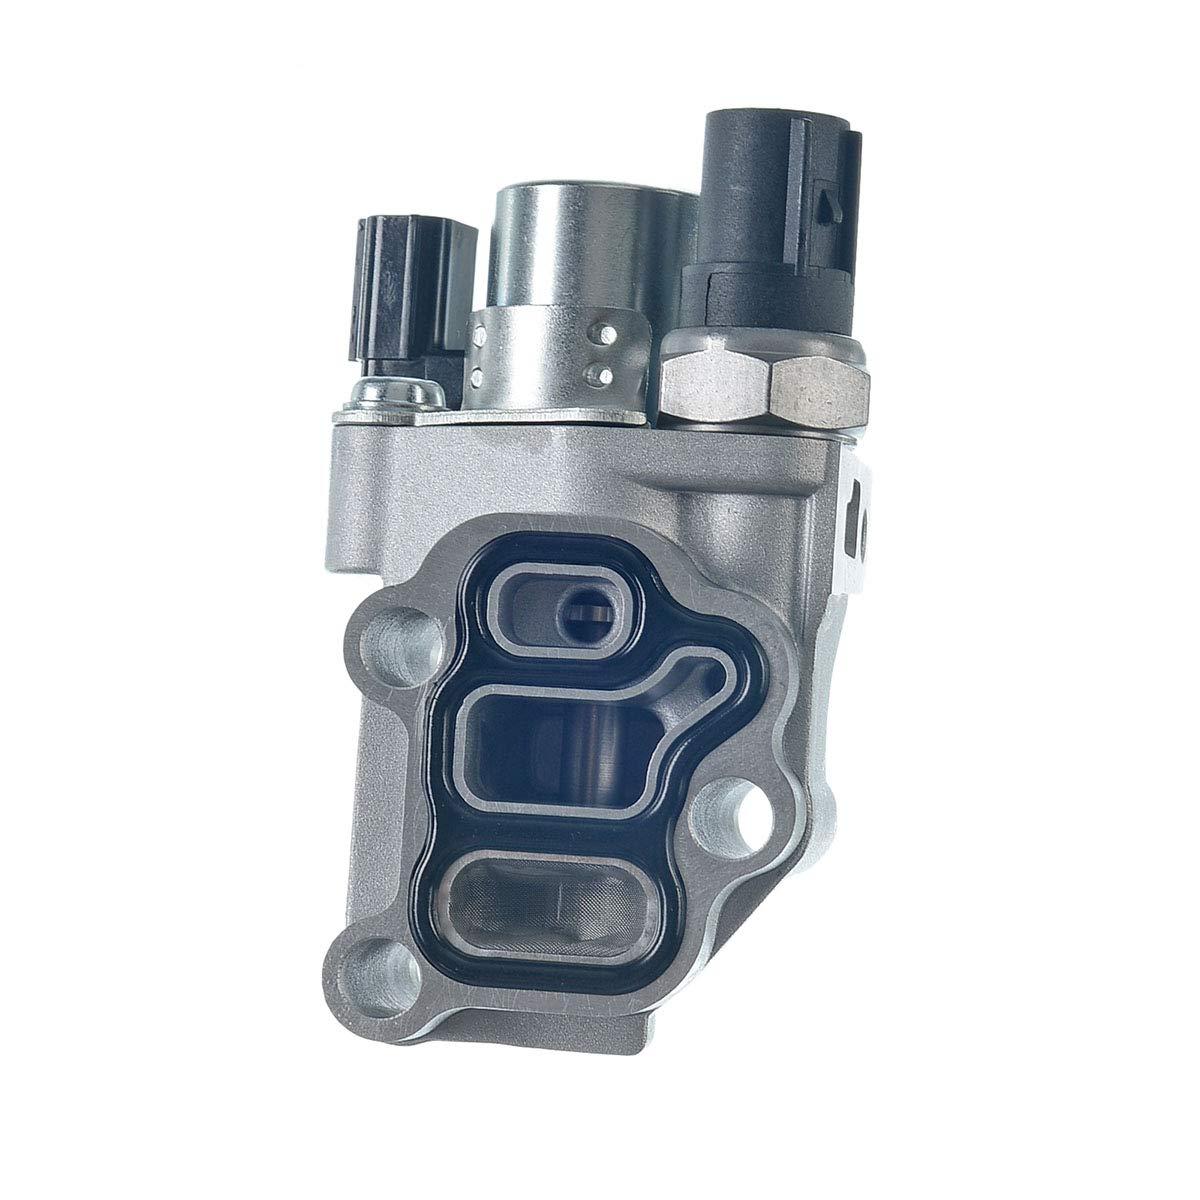 Magnetventil Ventil f/ür Accord VII VIII CL CM Civic VII EU EP EV ES CR-V II RD III RE Element YH TSX CL/_ 2000-2017 15810-PRB-A03